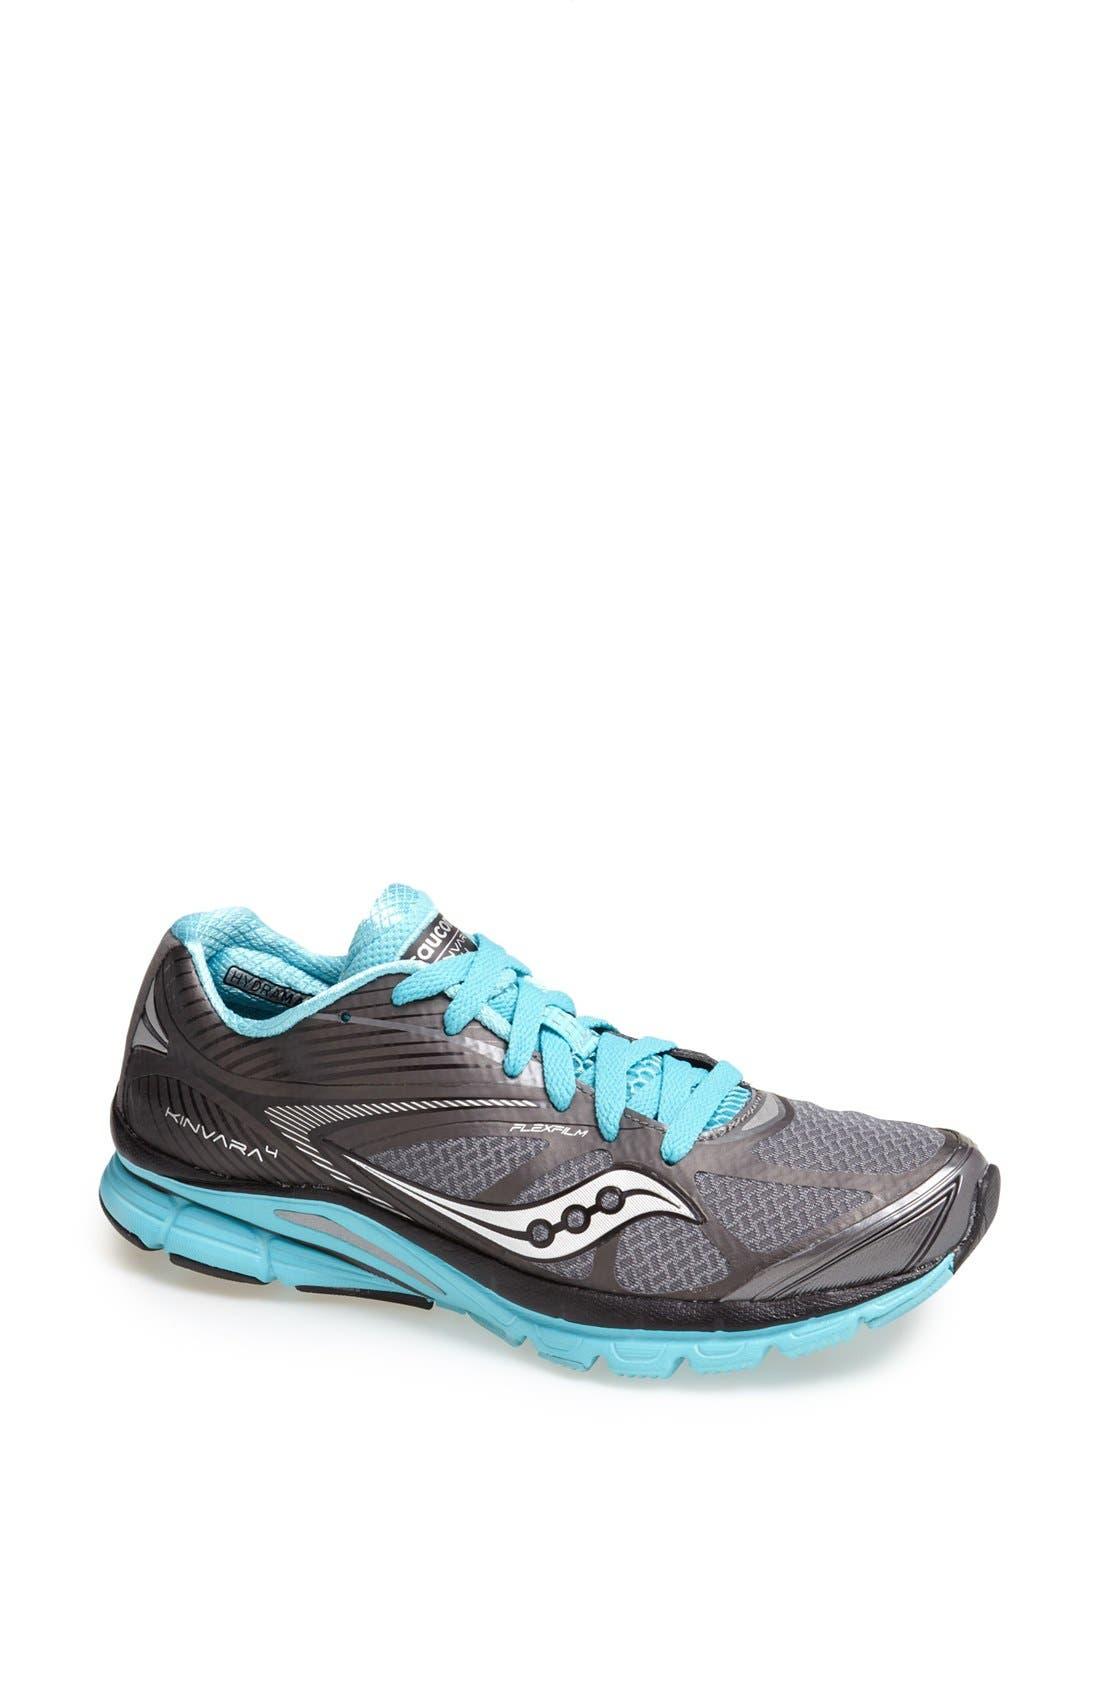 Alternate Image 1 Selected - Saucony 'Kinvara 4' Running Shoe (Women)